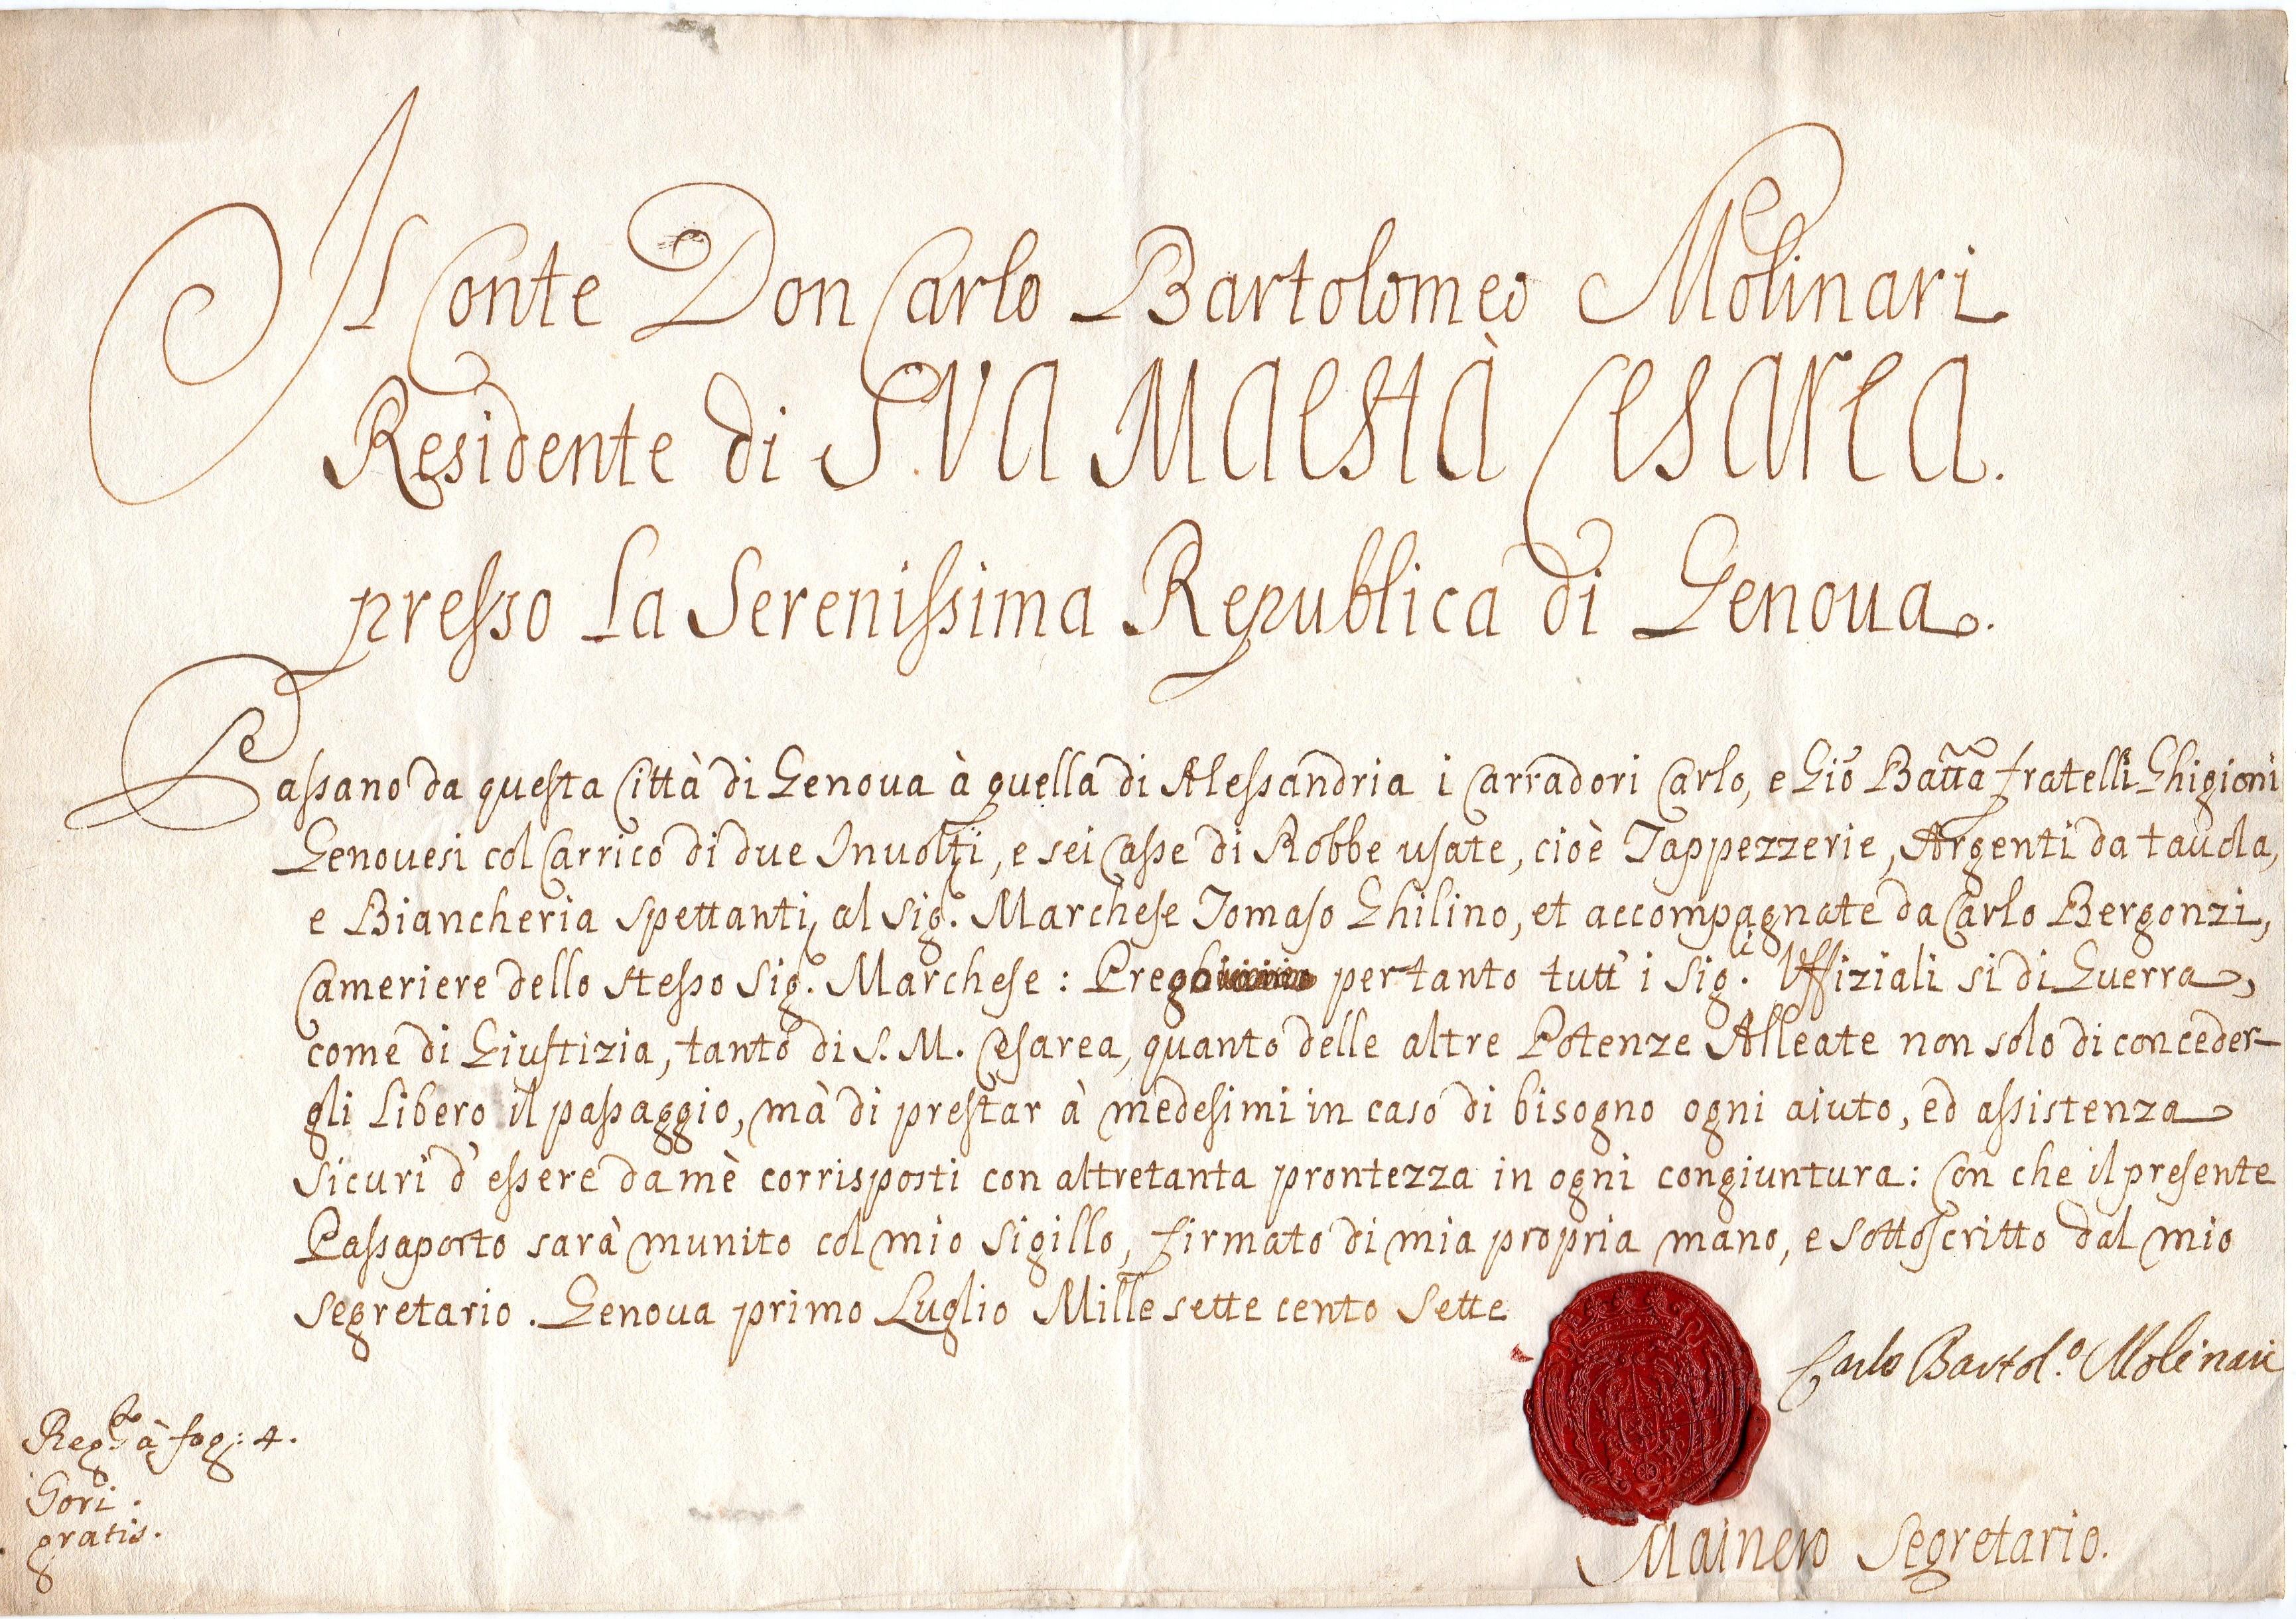 1707-Genova-serenissima